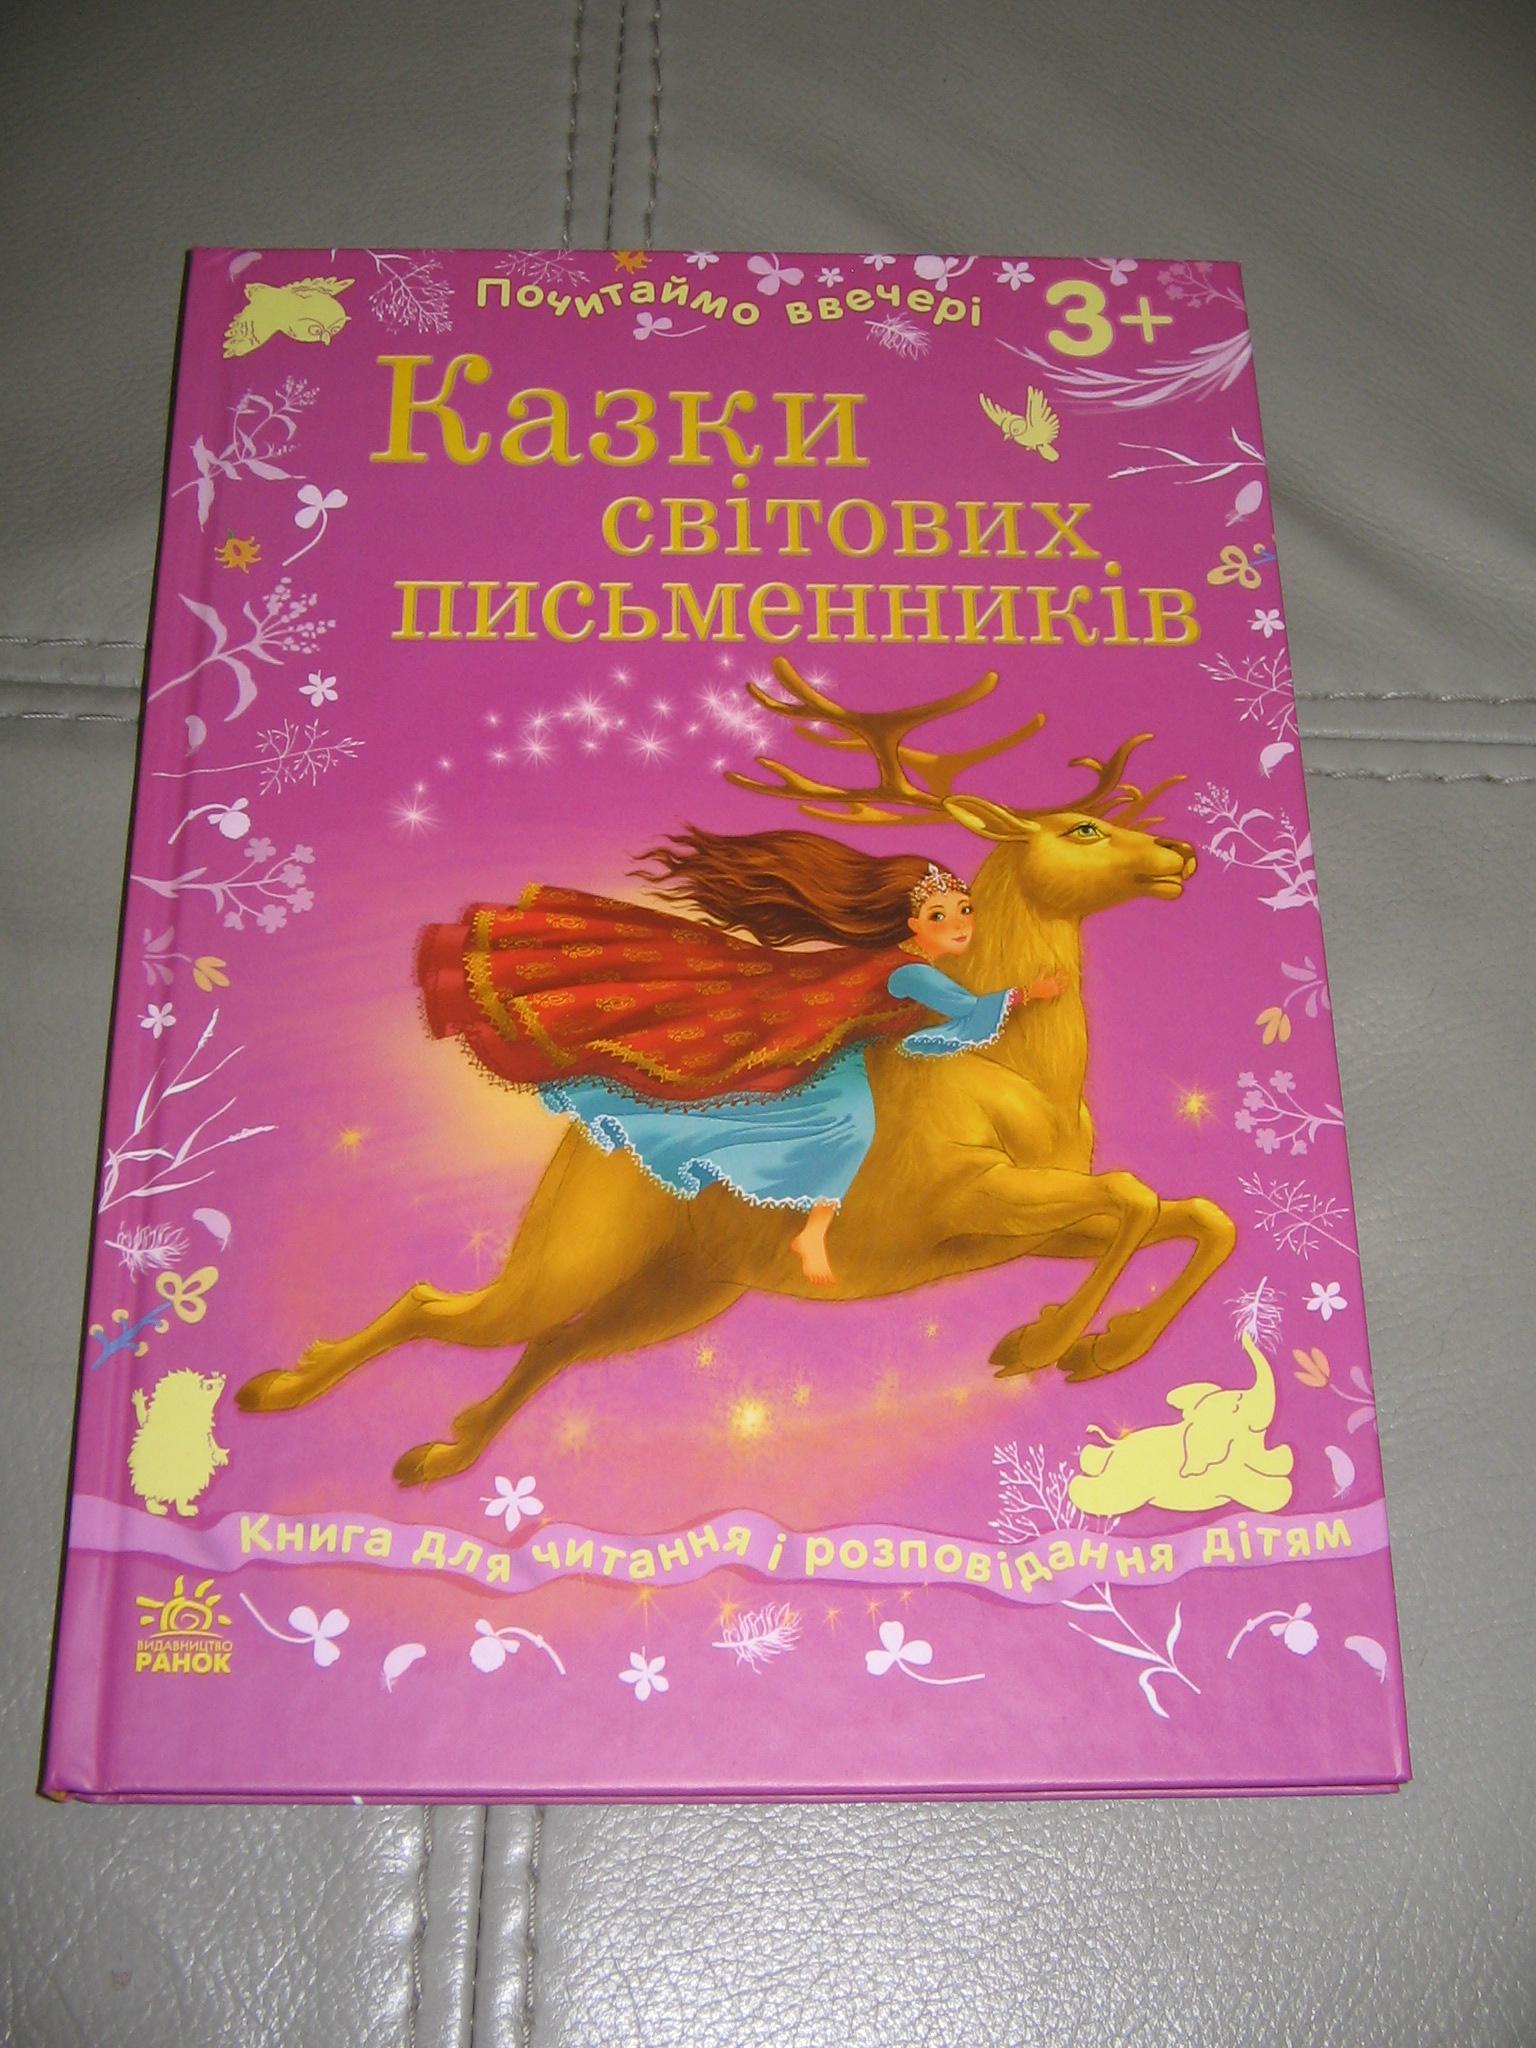 http://s3.uploads.ru/R1Evh.jpg